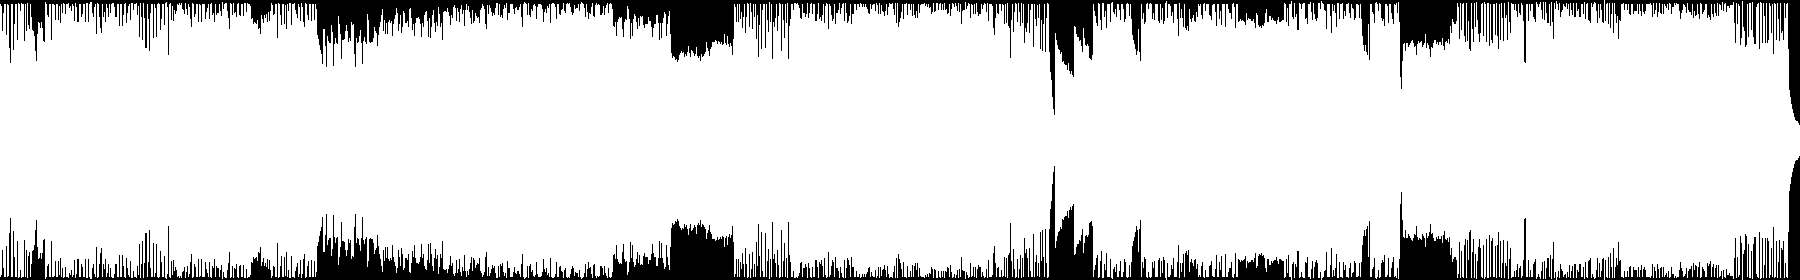 Eye of Horus audio waveform